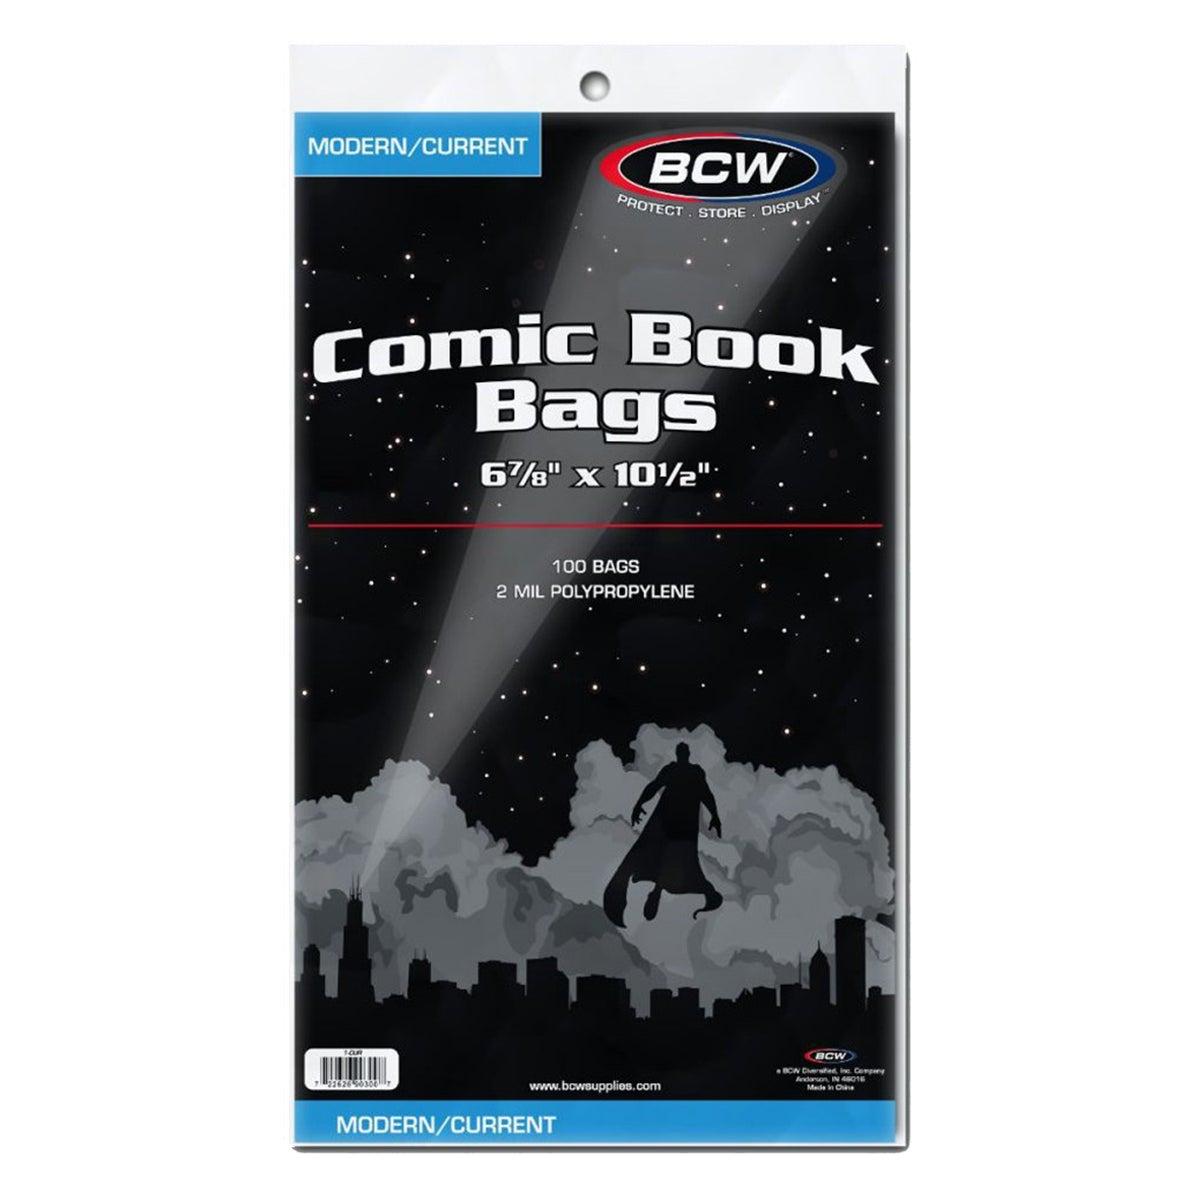 "BCW Comic Book Bags Current Comics 6"" 7/8 x 10"" 1/2 100pc"